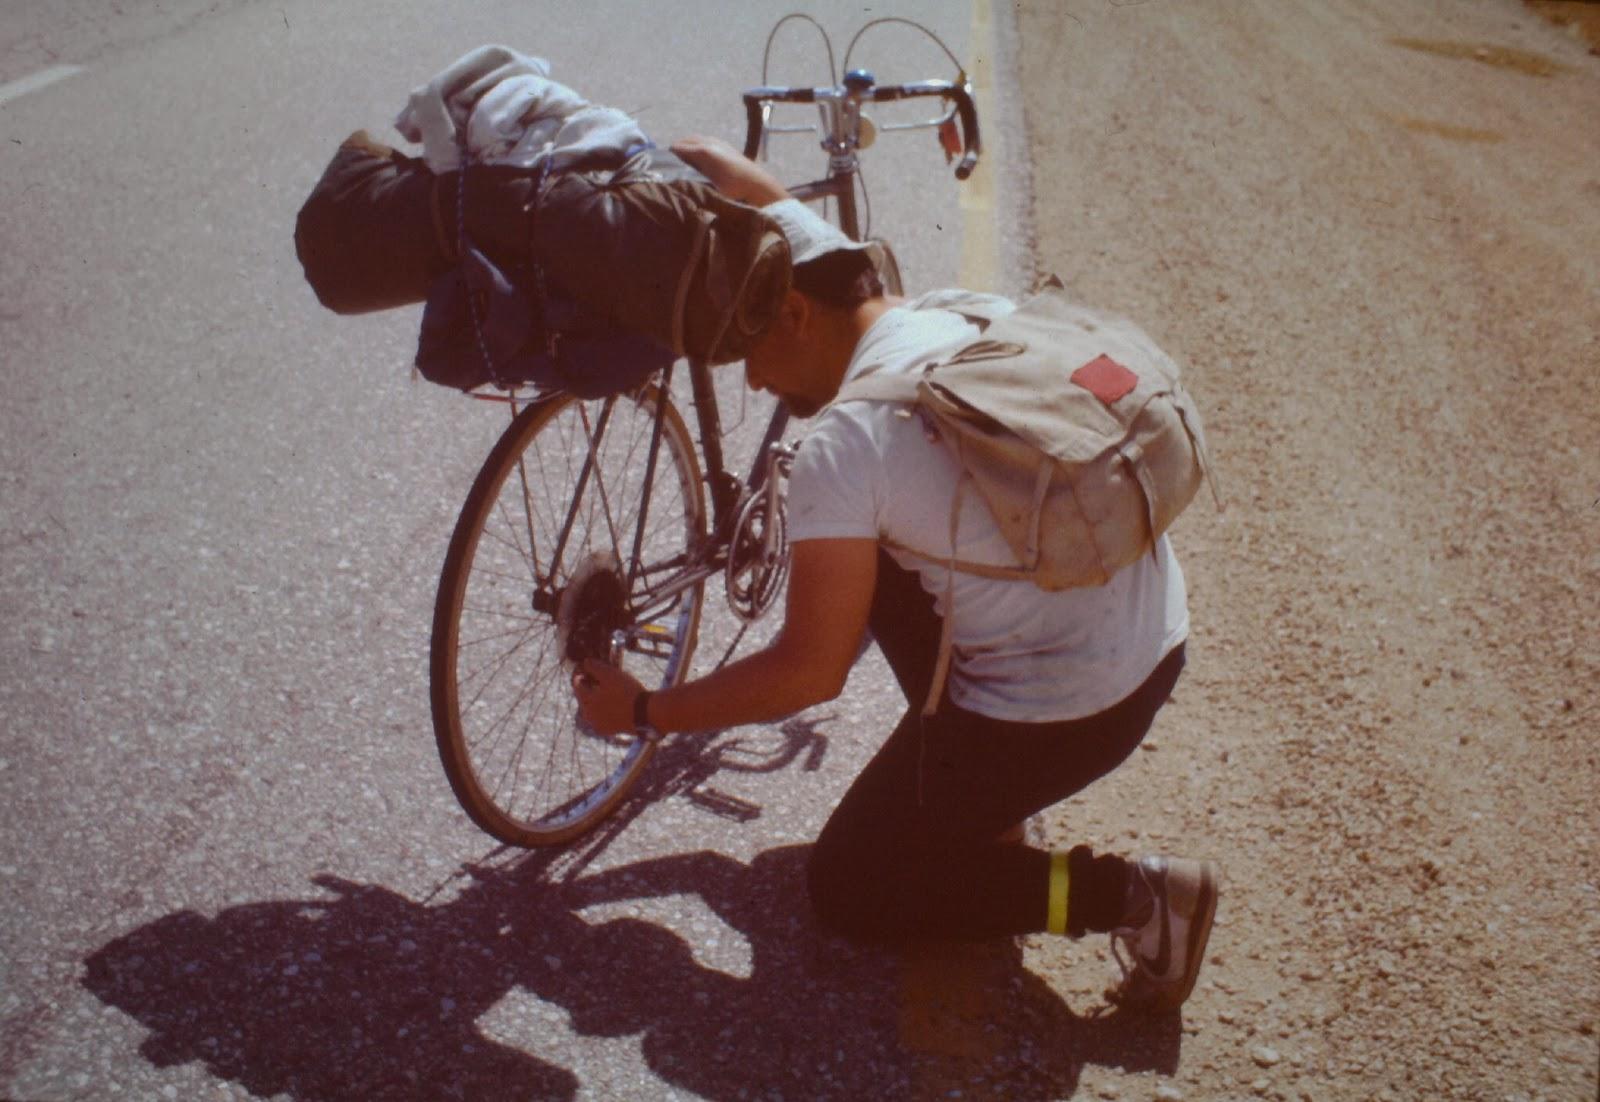 Ad-hoc Fahrrad-Reparatur in der Wüste.